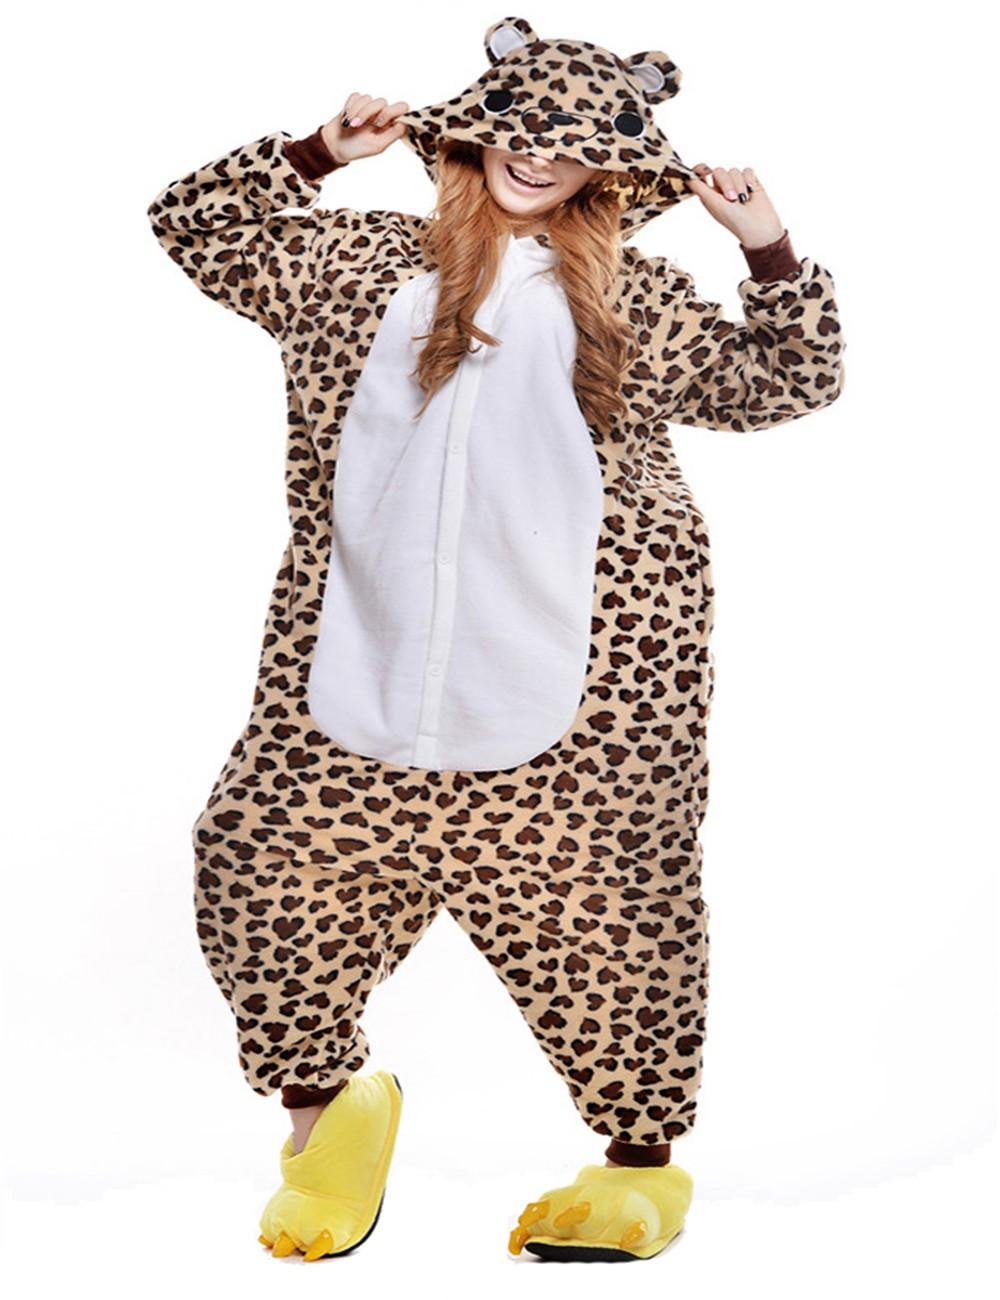 Fashion Leopard Kigurumi Unisex Adult Animal Onesies Chirstmas Pajamas Sets Halloween Costume Cosplay Onesie Hoodies HomewearОдежда и ак�е��уары<br><br><br>Aliexpress